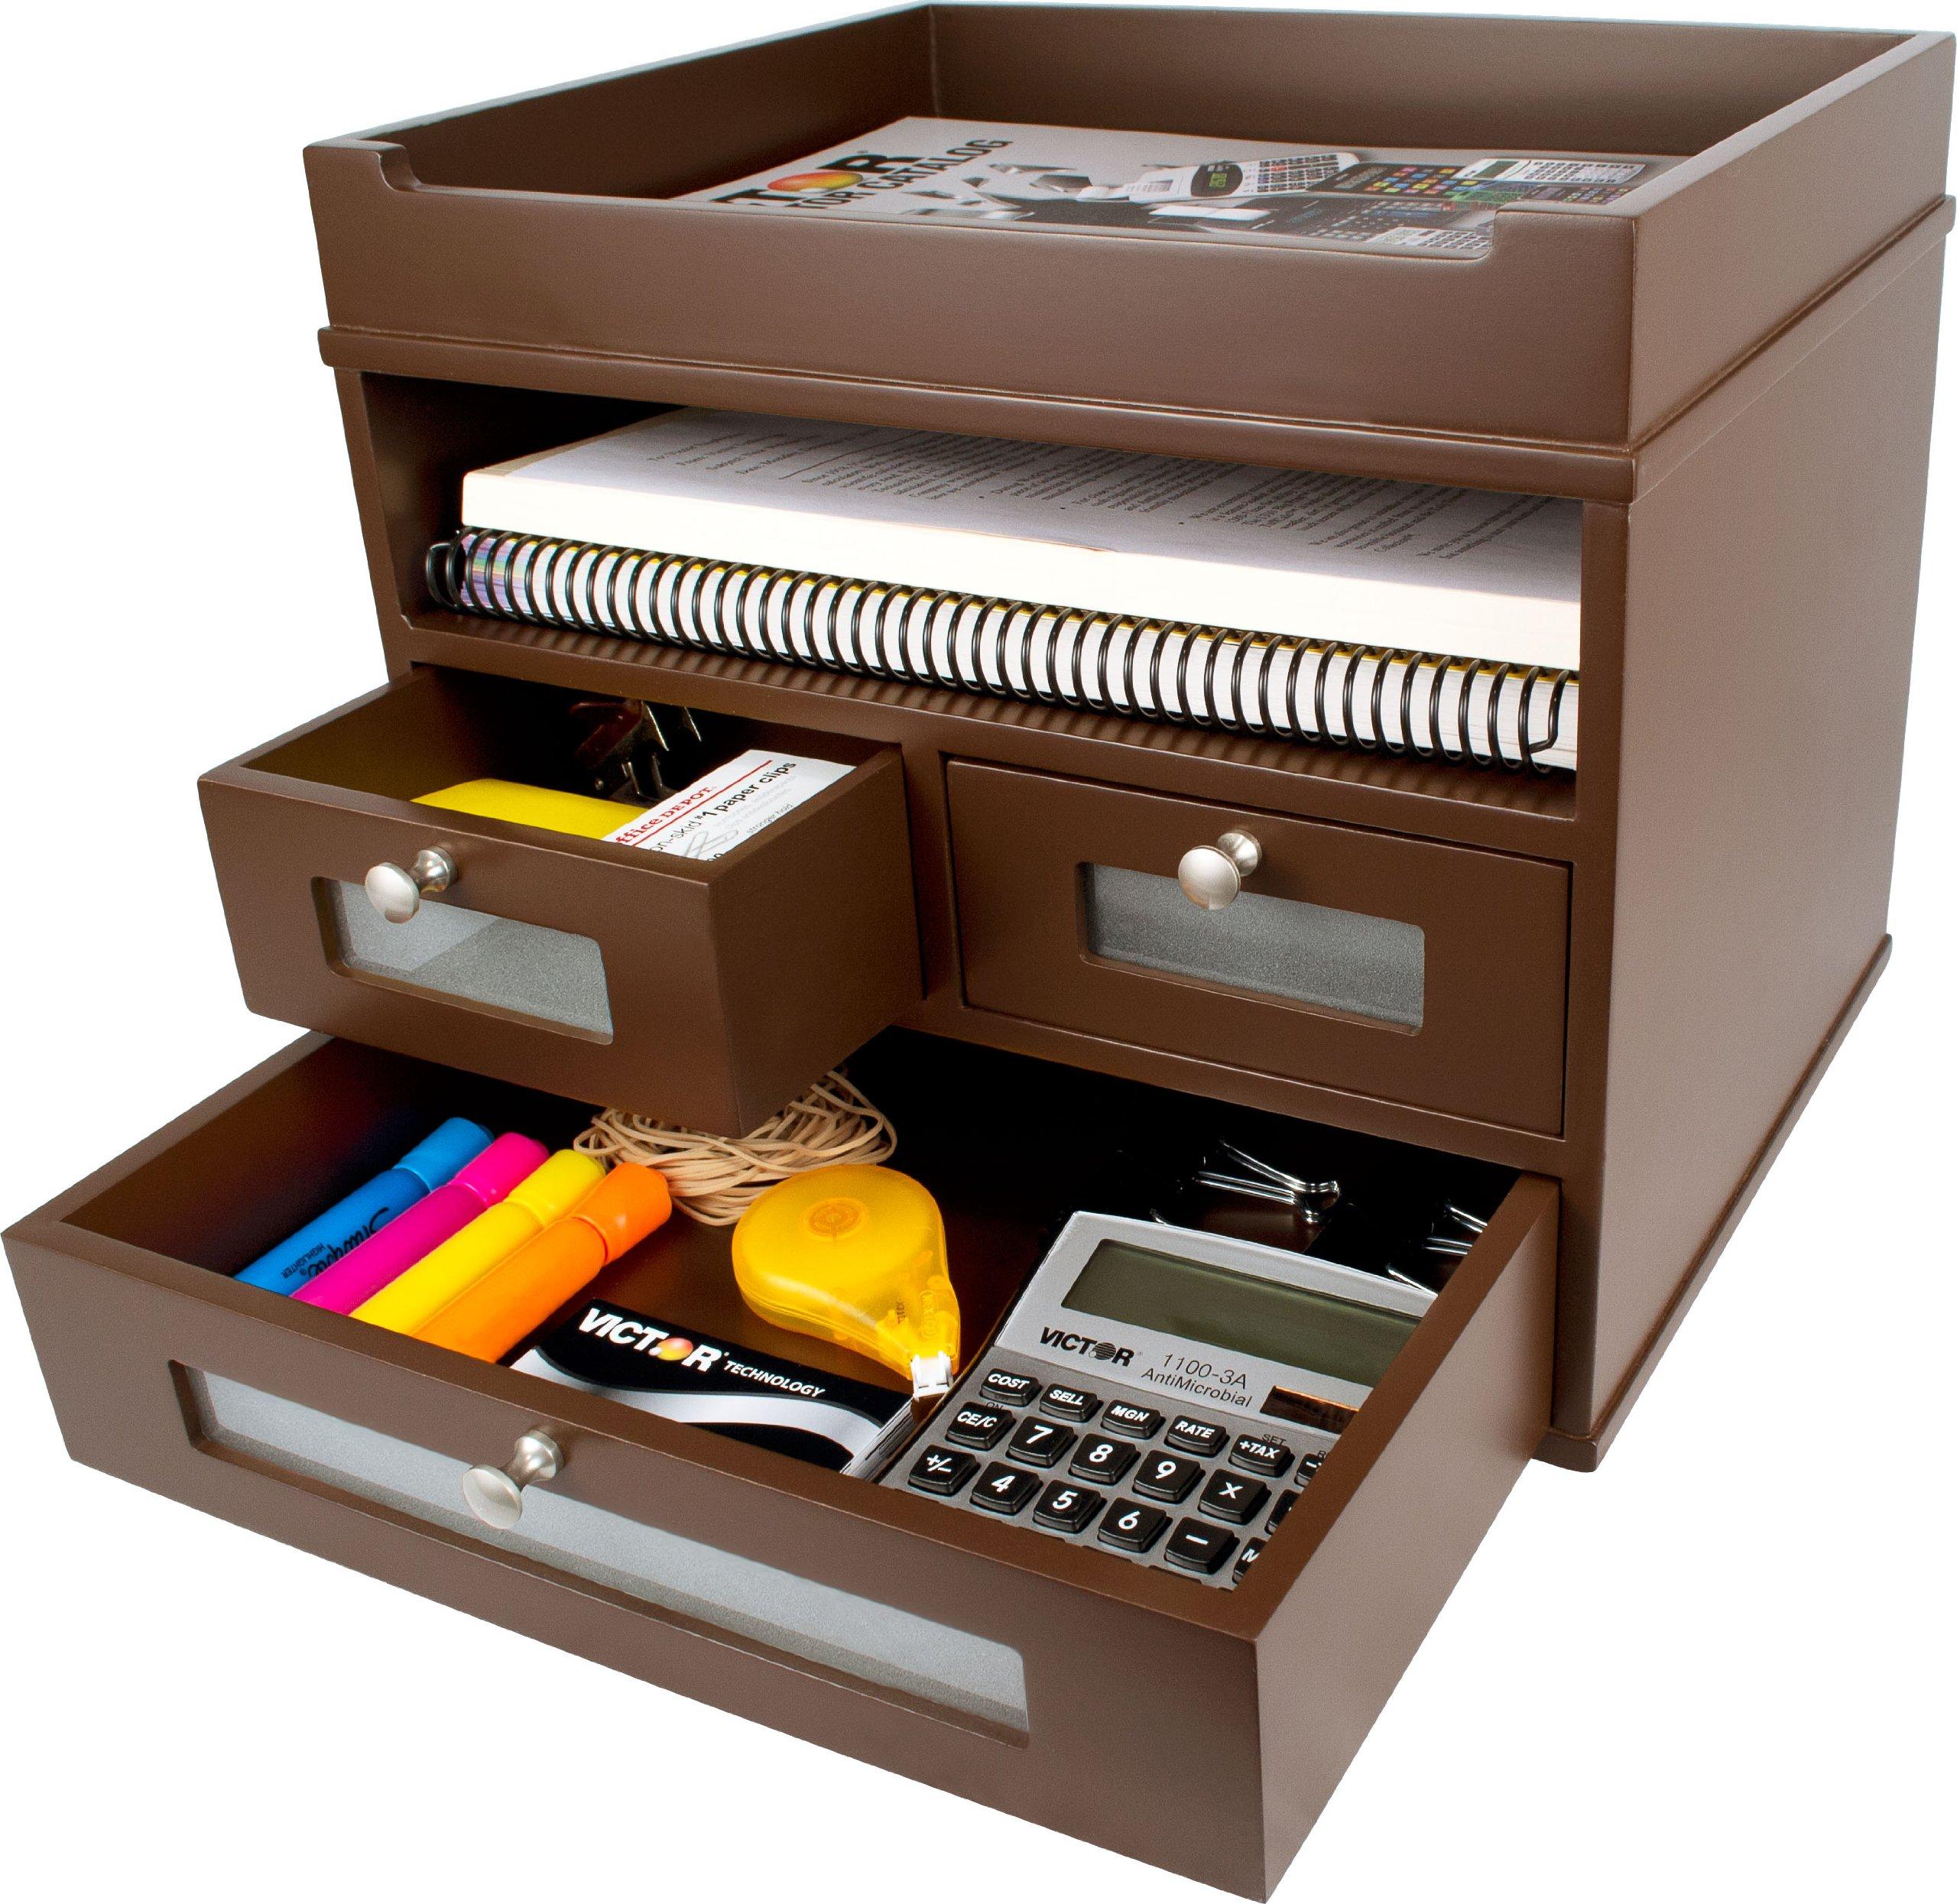 Victor Wood Tidy Tower Desktop Organizer, B5500 (Mocha Brown)